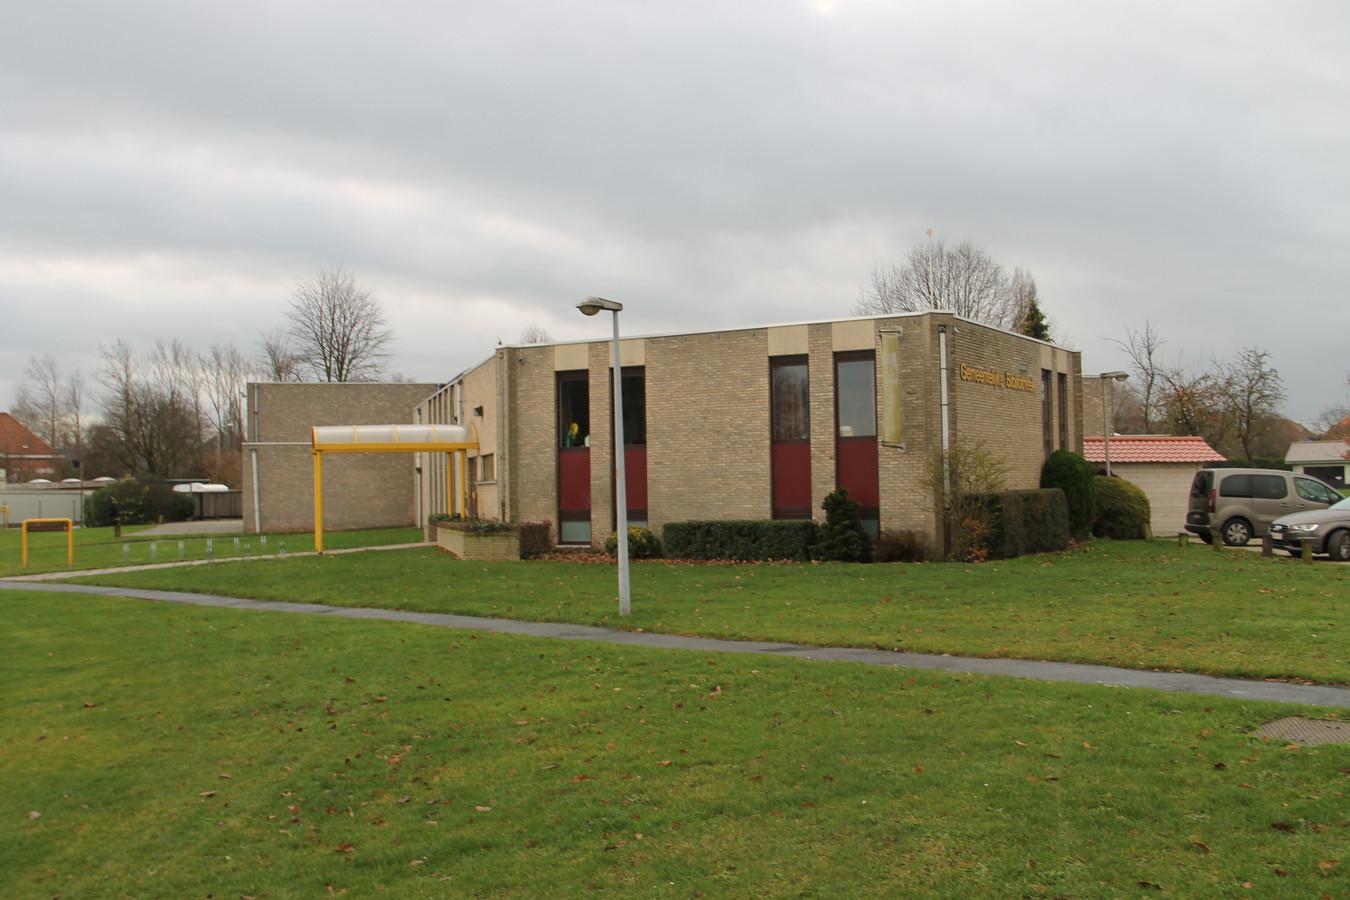 Ontmoetingscentrum Hondius in Wakken.